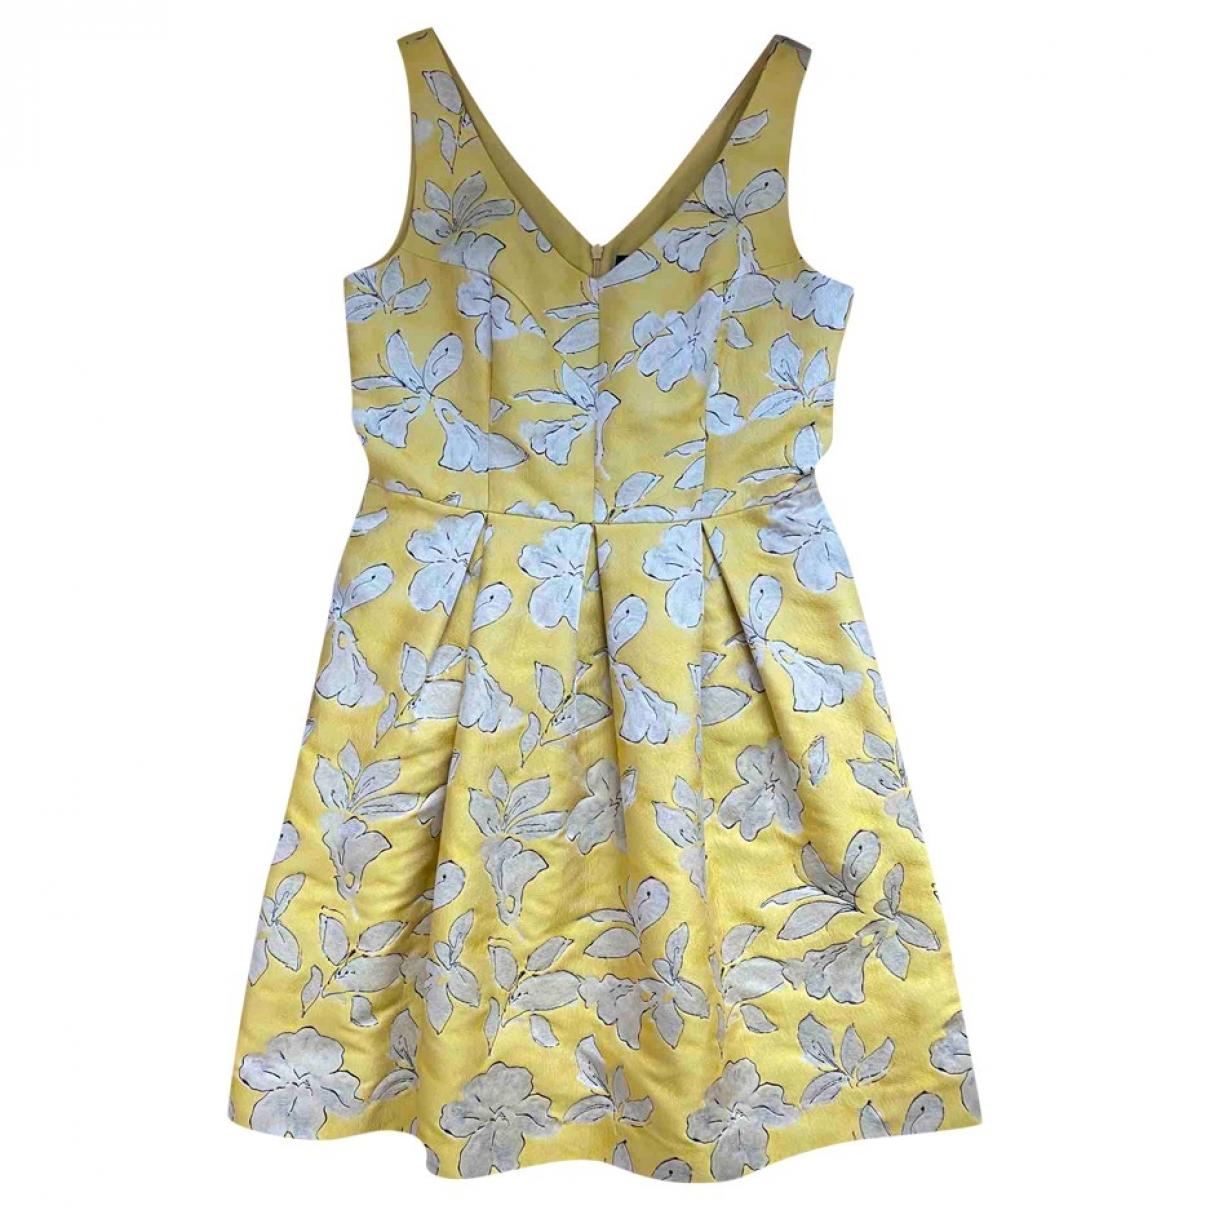 Hallhuber \N Kleid in  Gelb Veloursleder